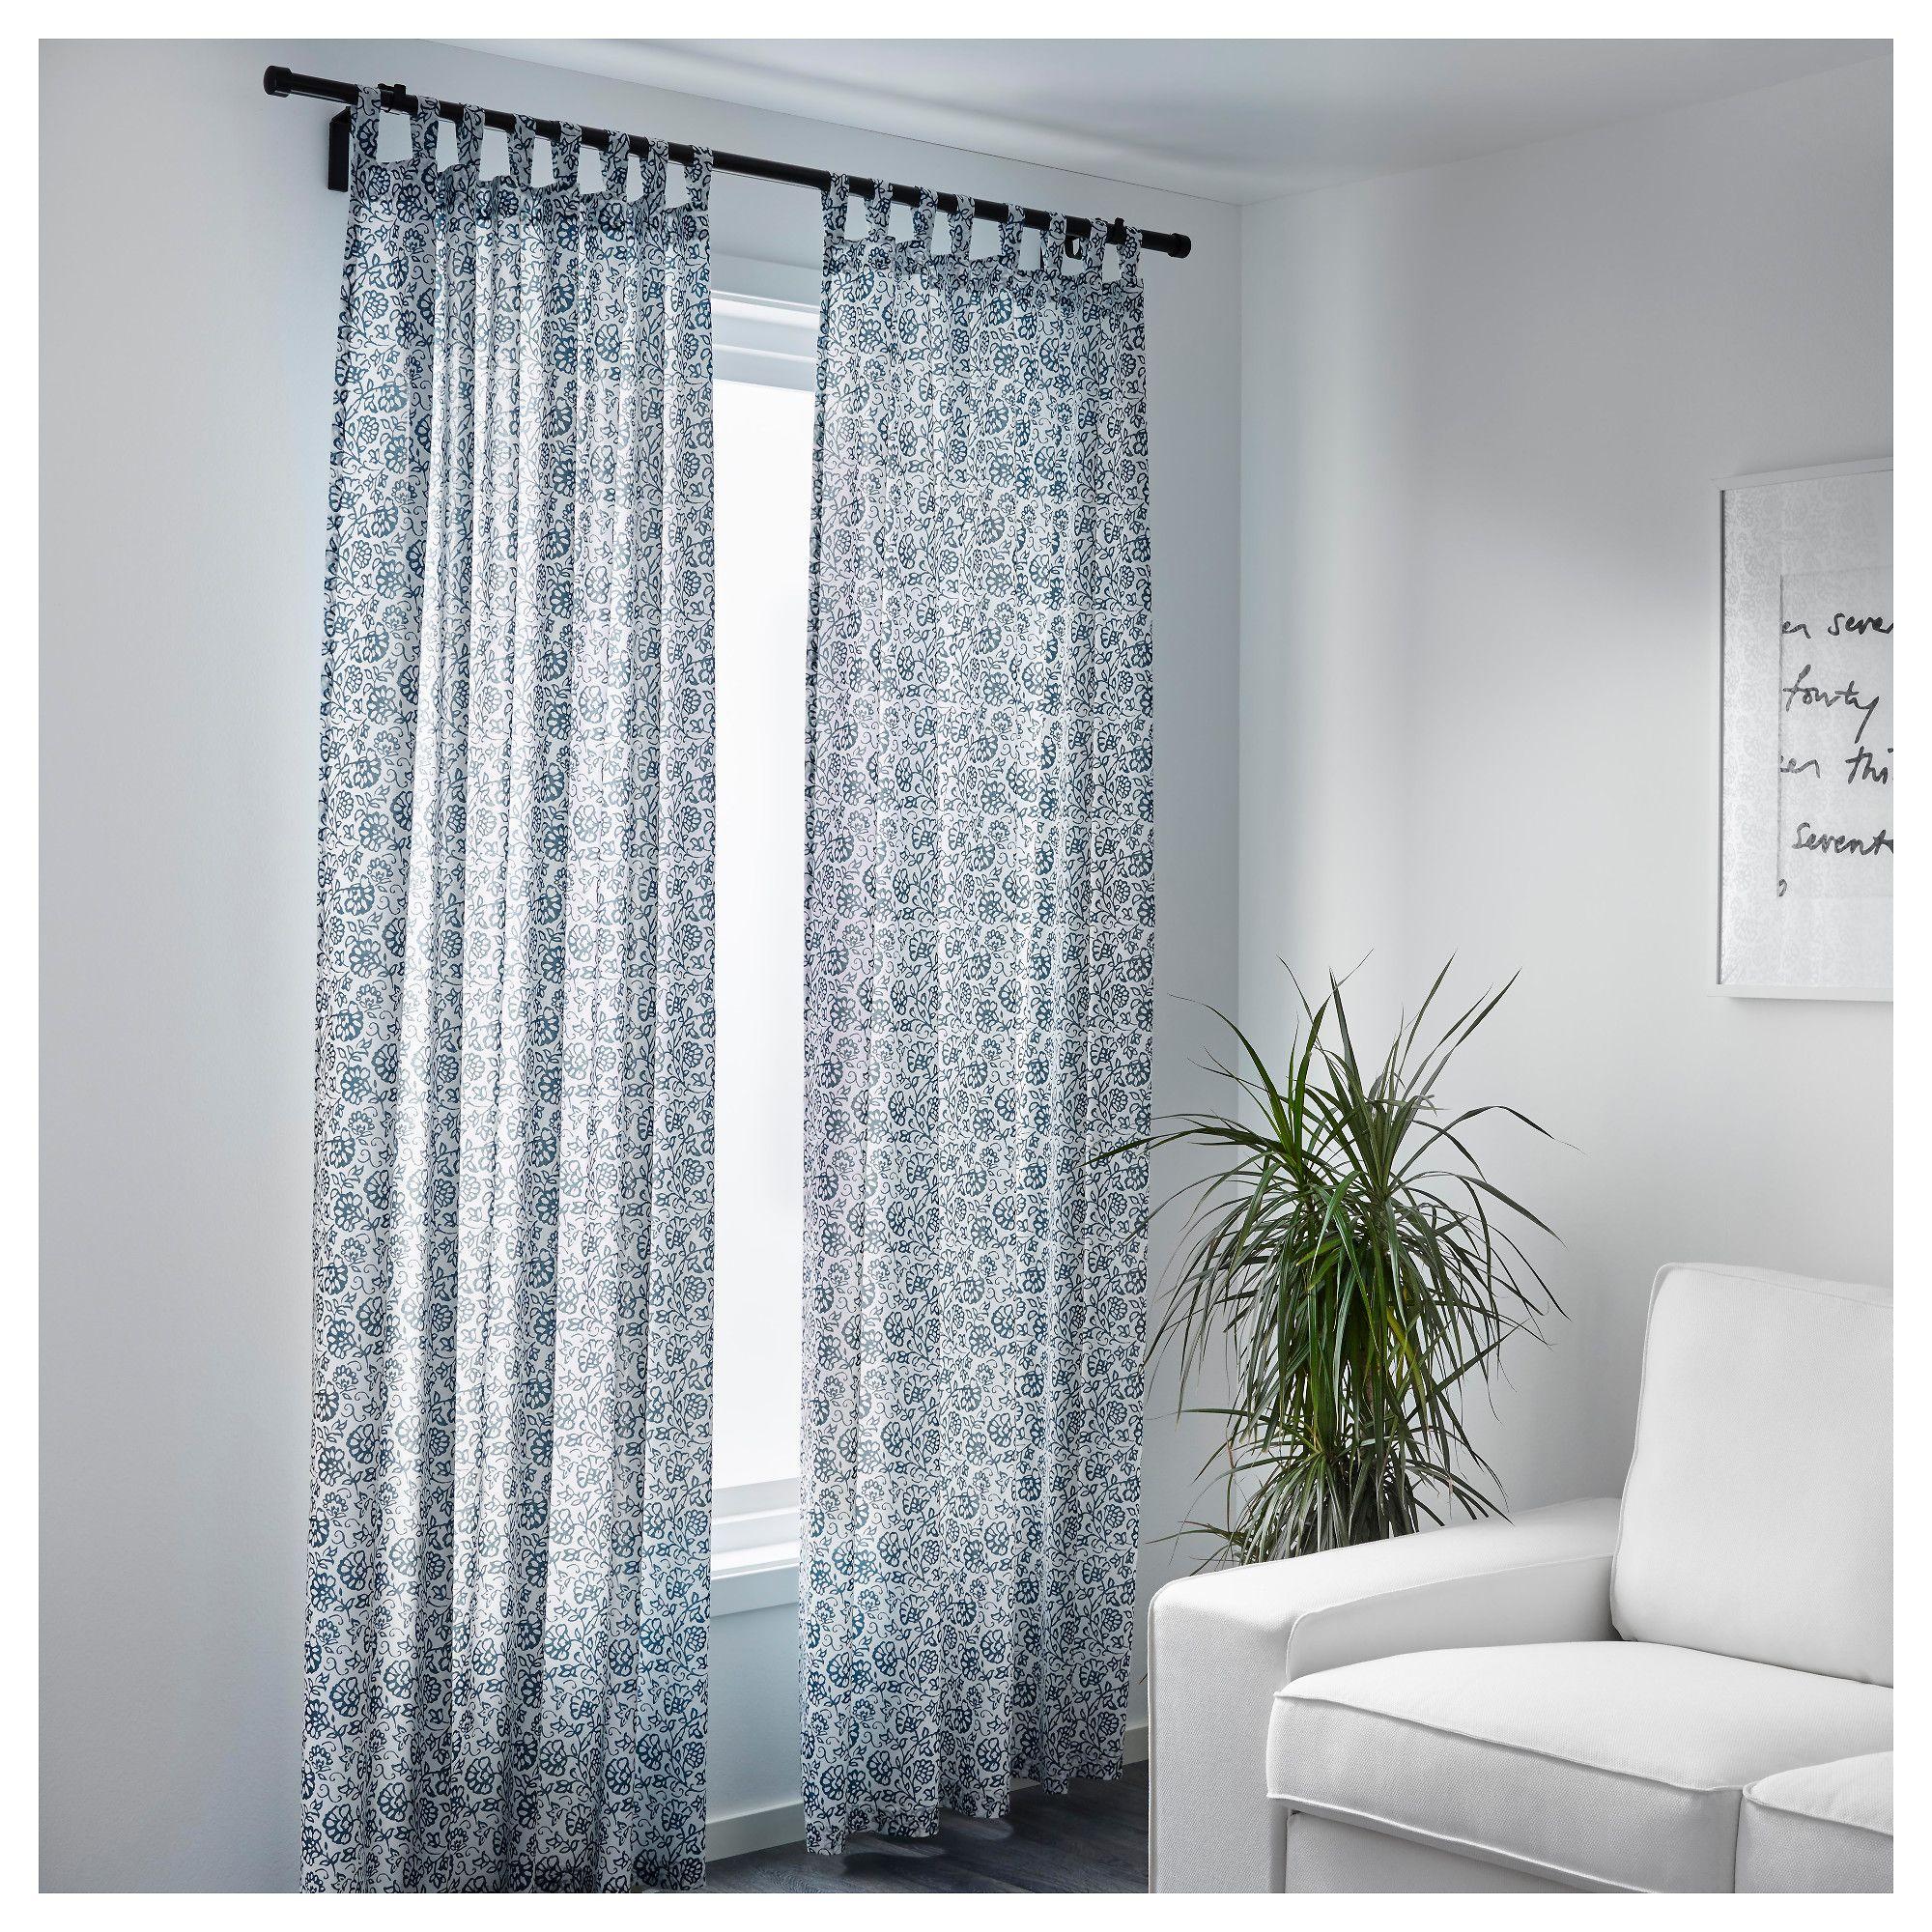 rideau anti bruit ikea beautiful rideau anti bruit ikea rideau miri prune x with rideau anti. Black Bedroom Furniture Sets. Home Design Ideas